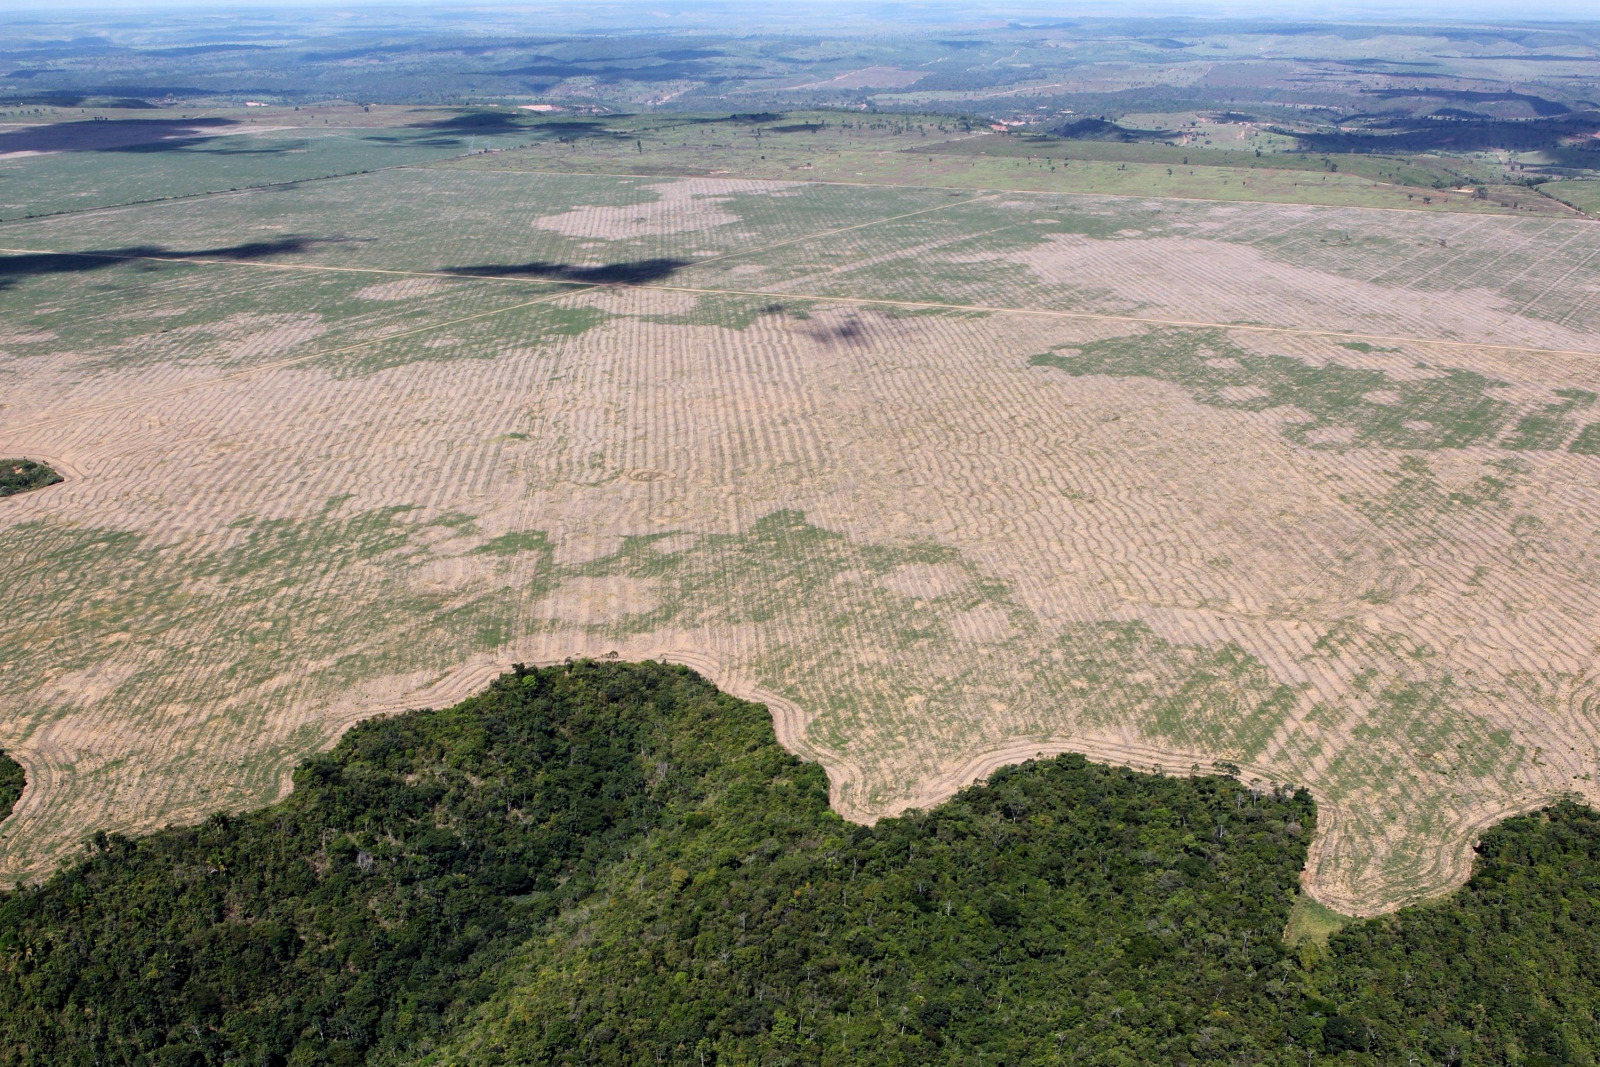 Waldrodung Deforestation